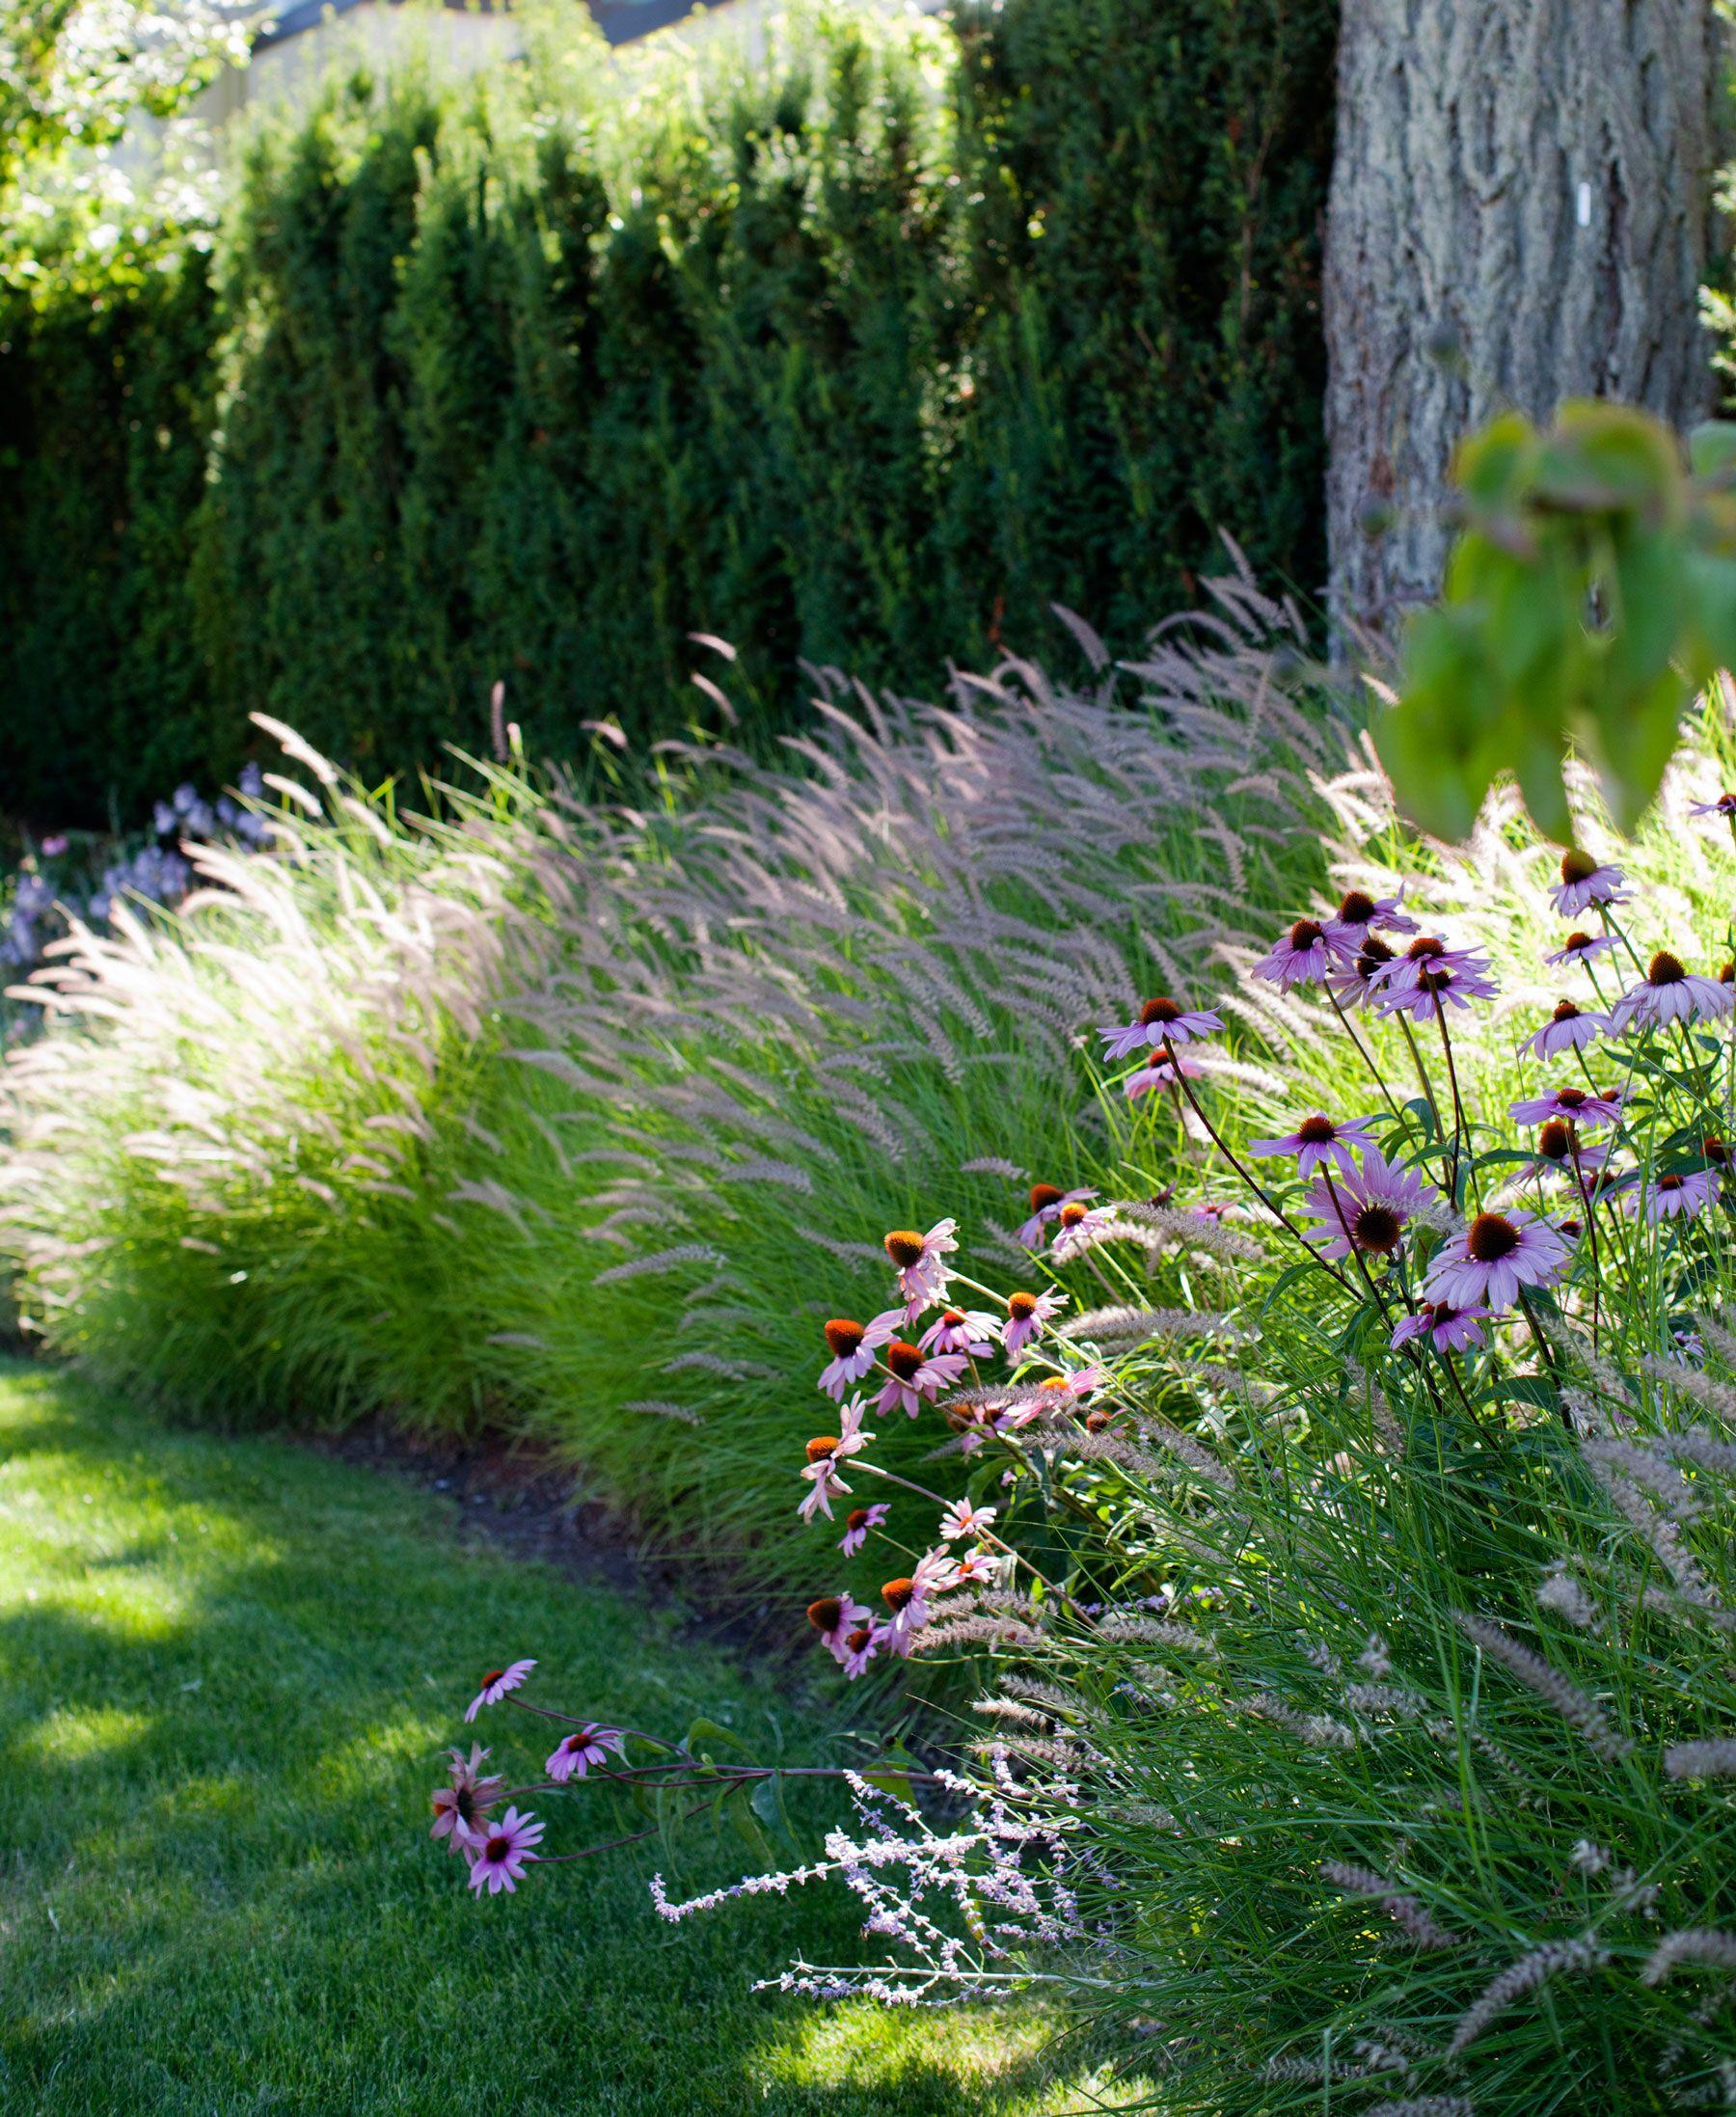 Residential Landscape Design Vancouver Echinacea Purpurea And Pennisetum Grasses Modern